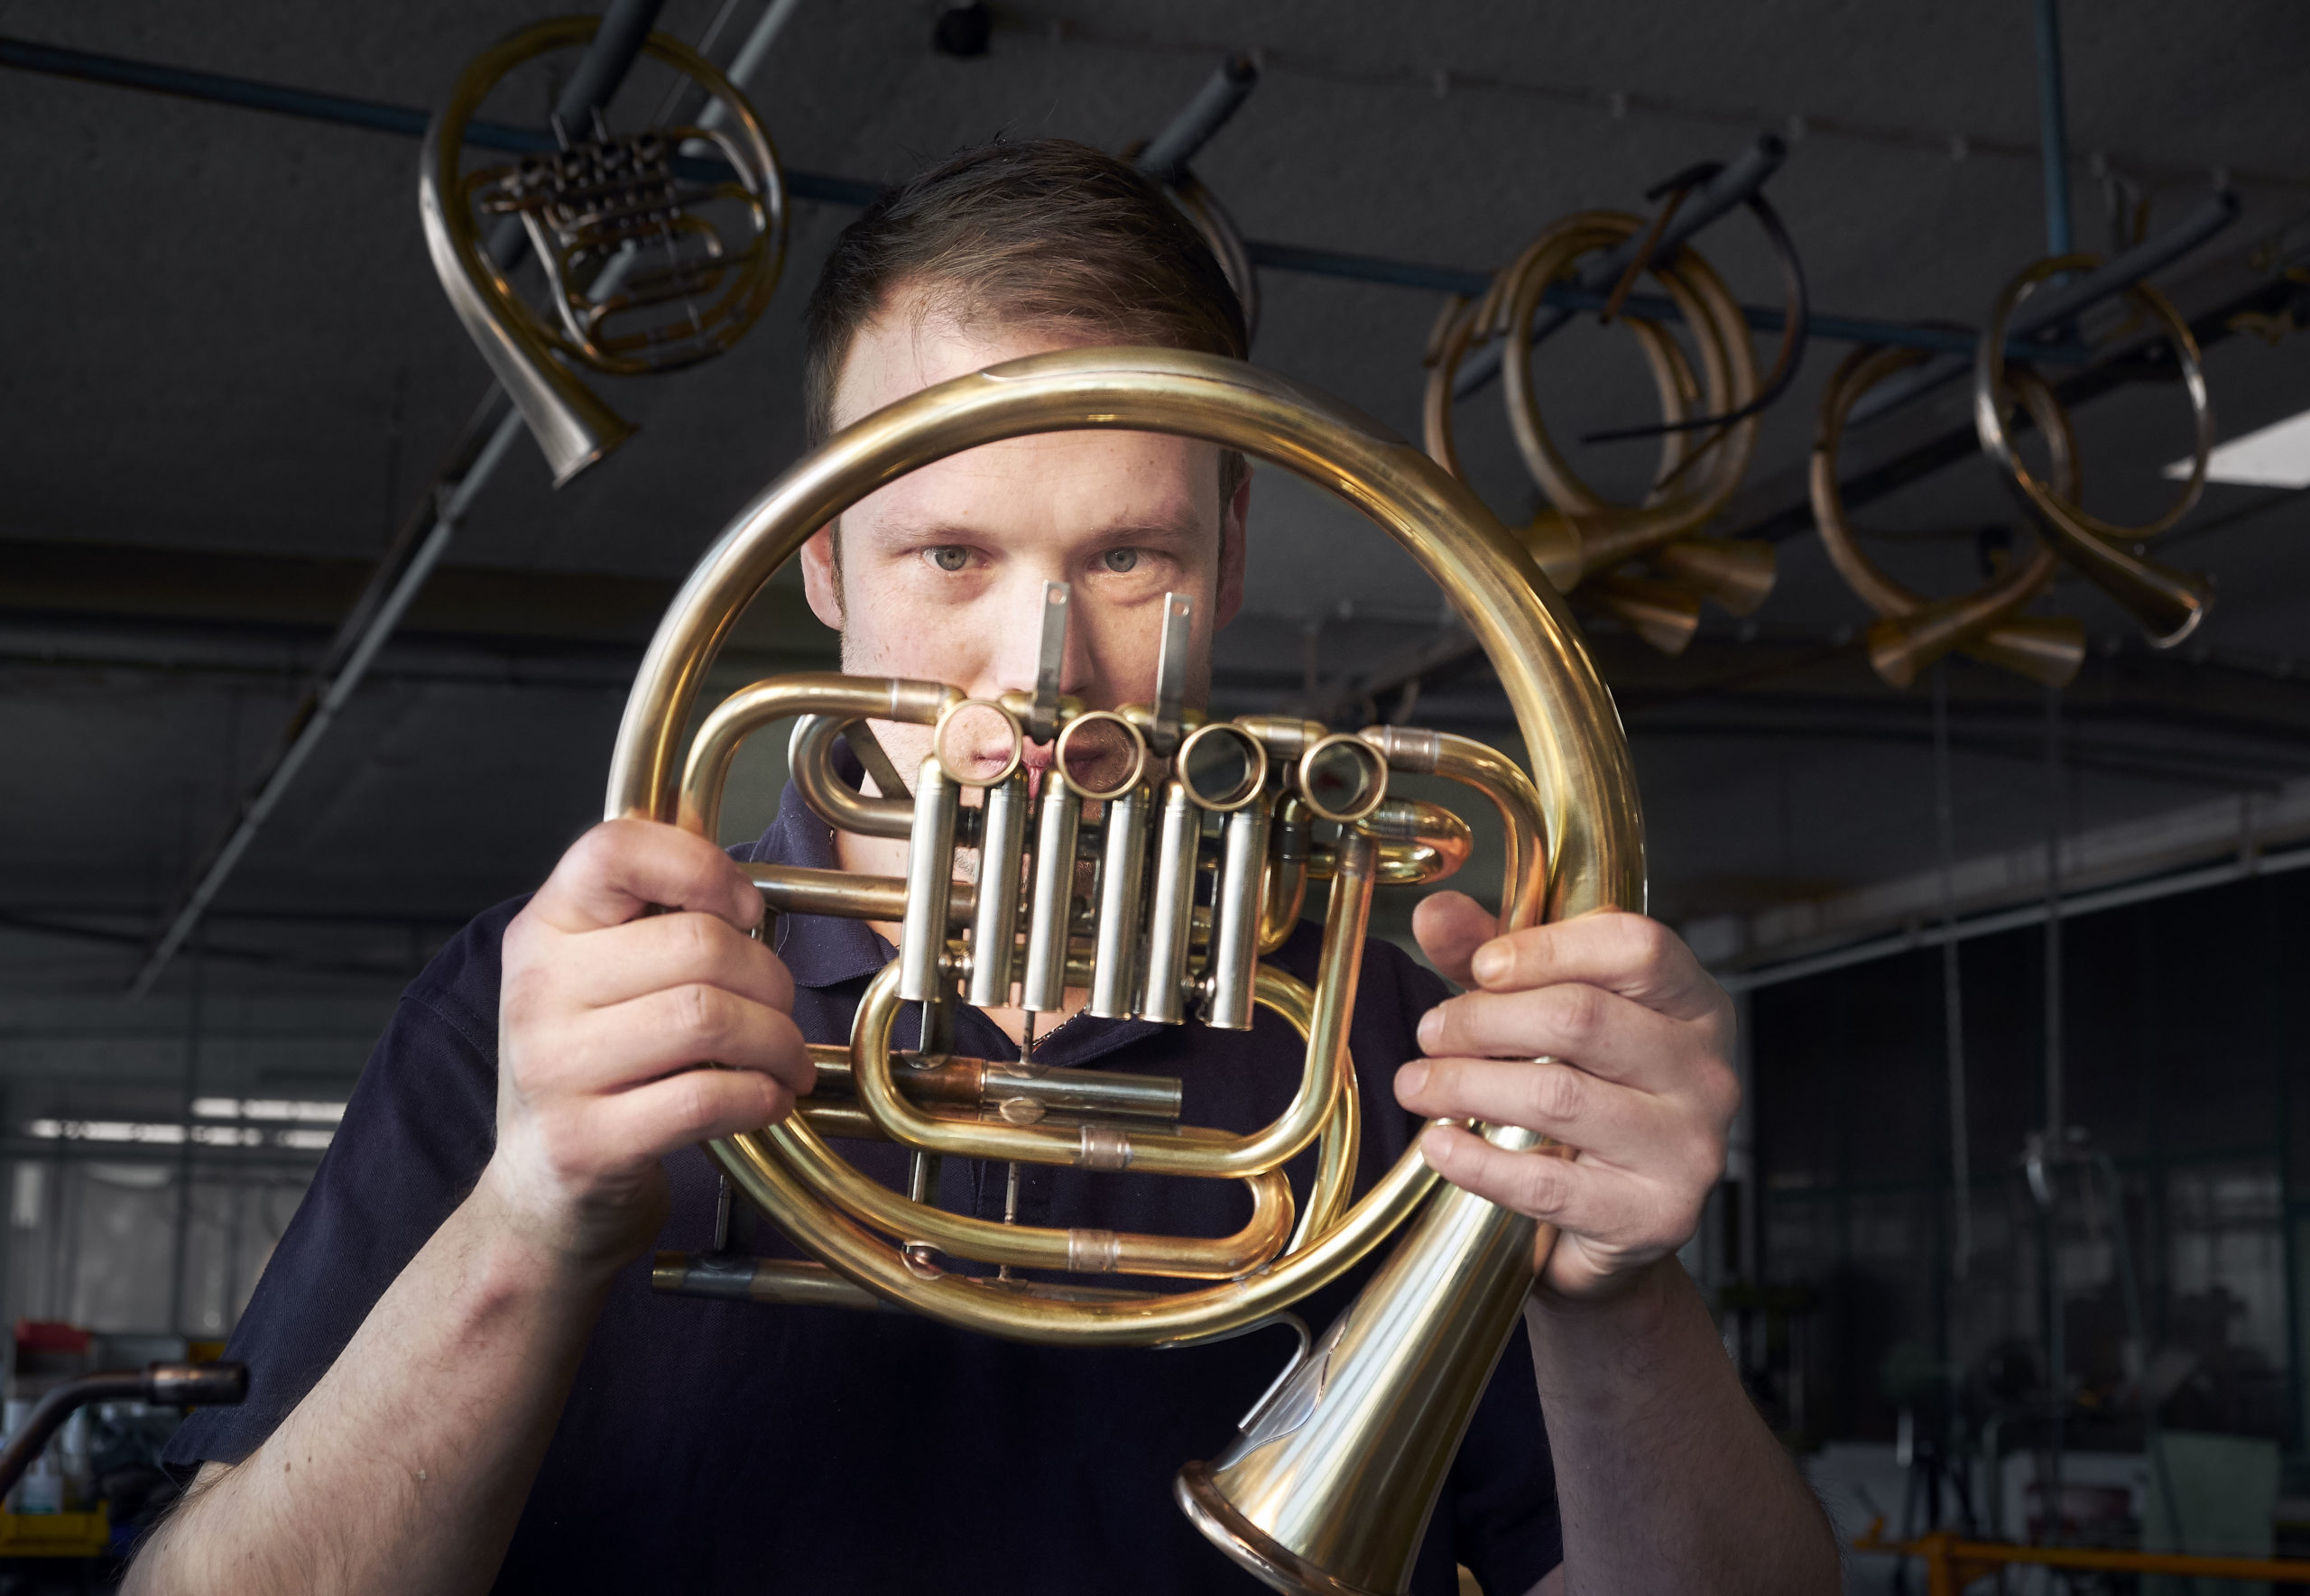 Finke Horns in Vlotho, 17.4.2019, Michael Opritz